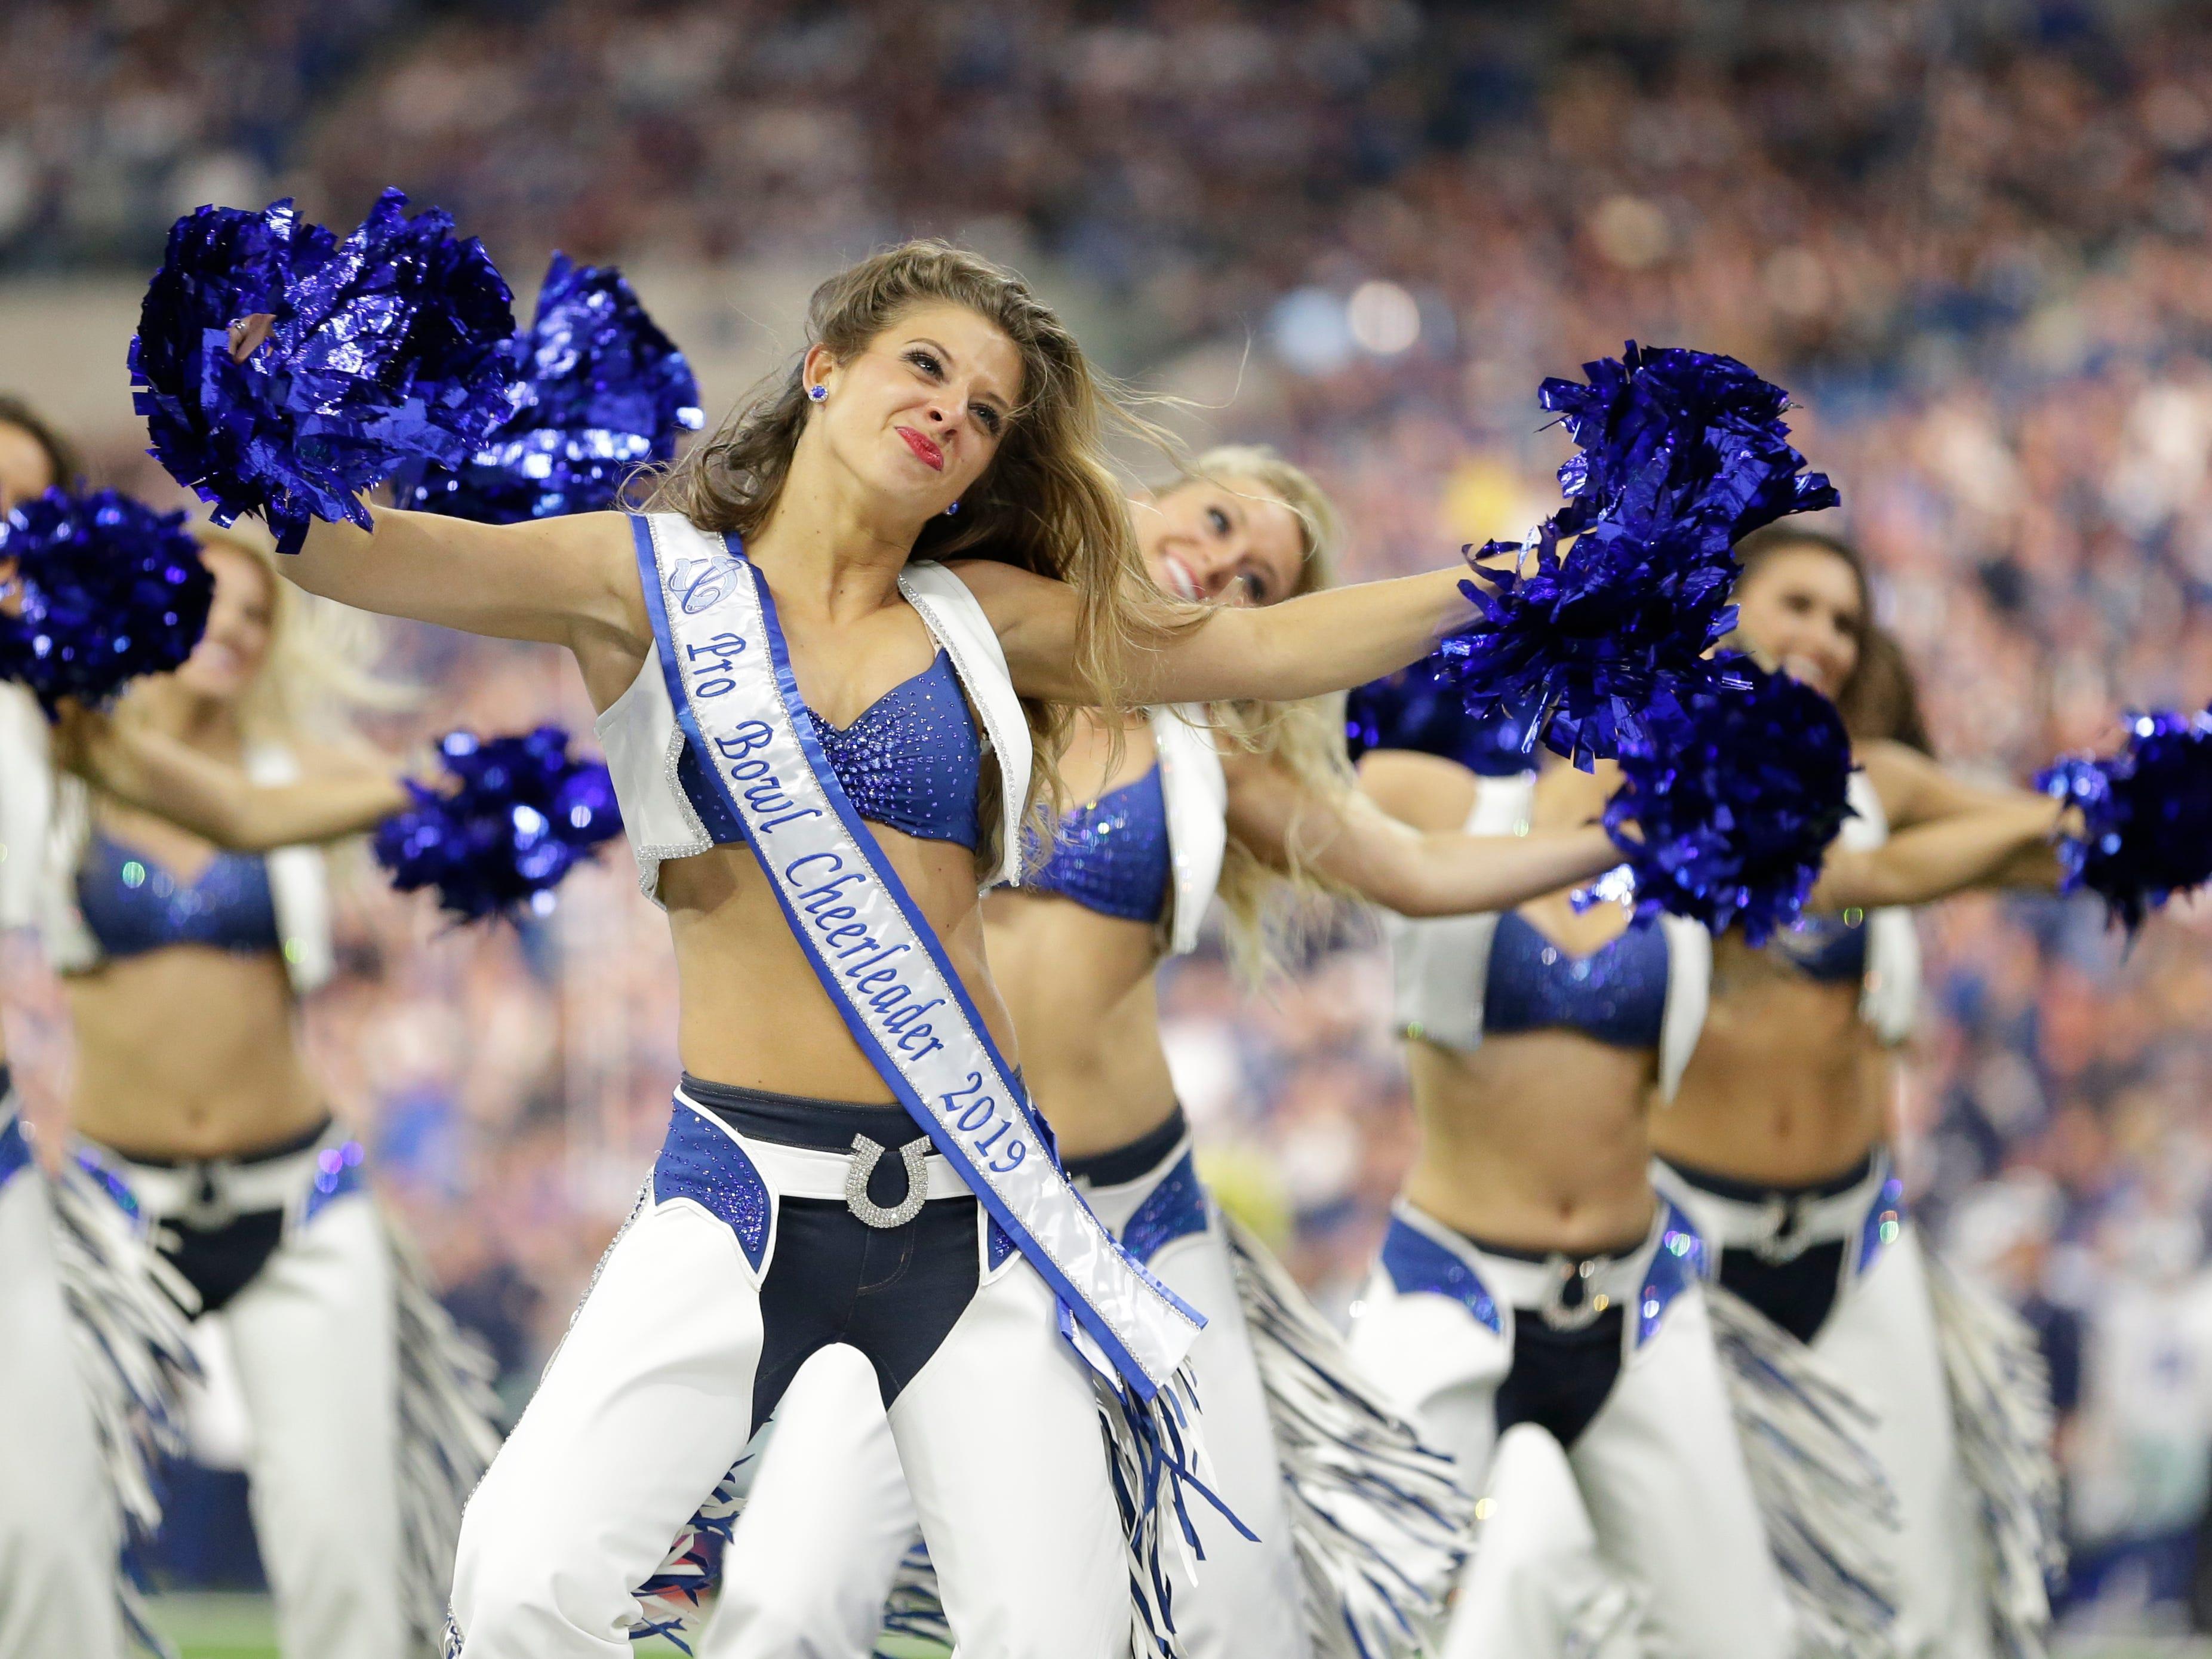 Week 15: Indianapolis Colts cheerleaders